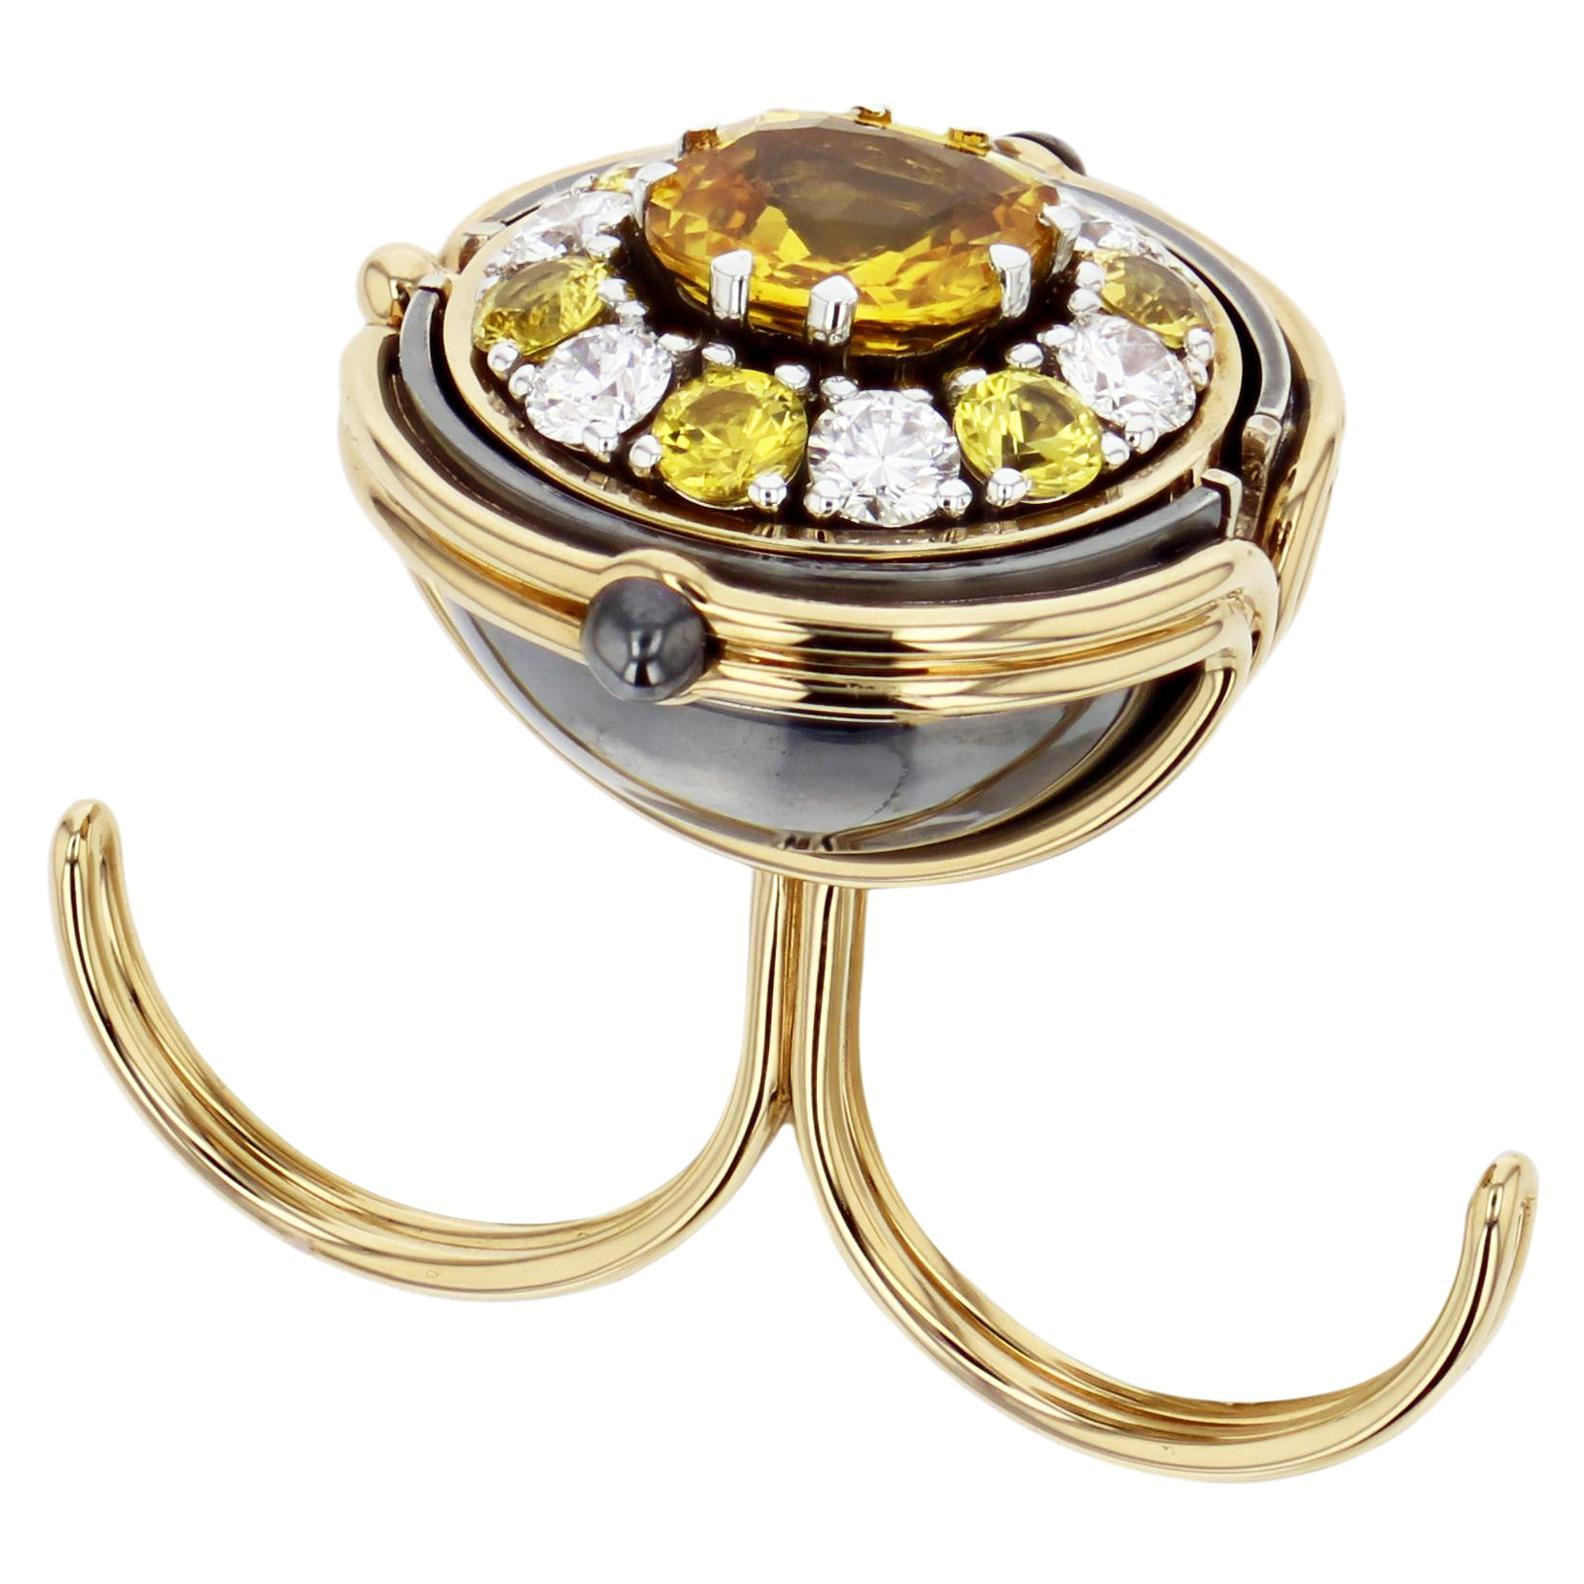 Pluton Sphere 18 Karat Gold Yellow Sapphire Diamond Double Ring by Elie Top